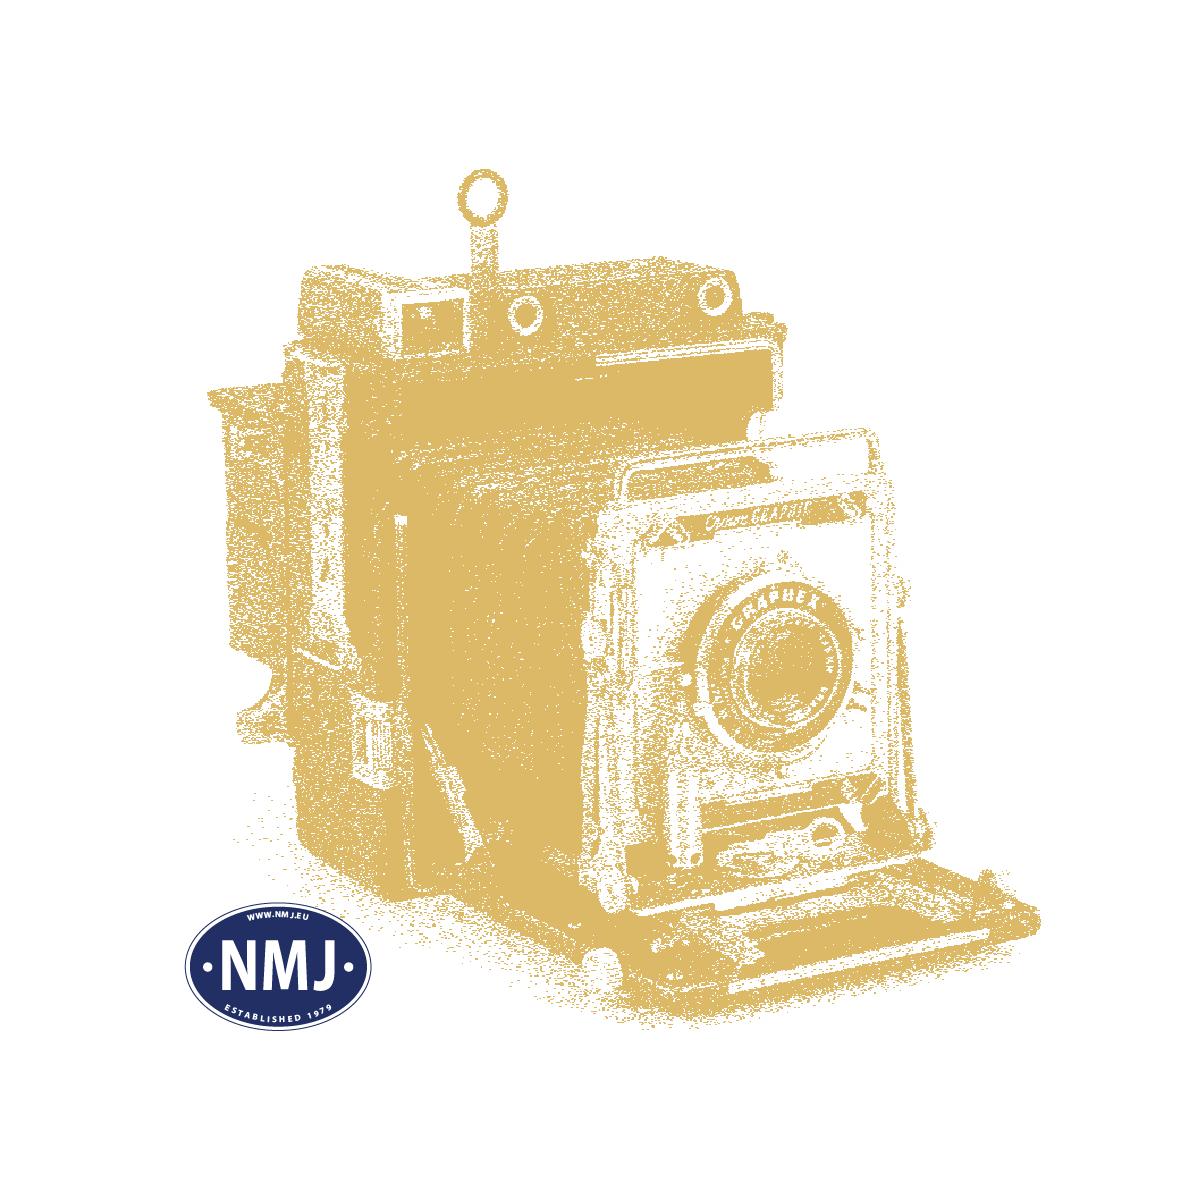 NMJKAT20 - NMJ Catalogue 2020, Superline, Topline, Skyline